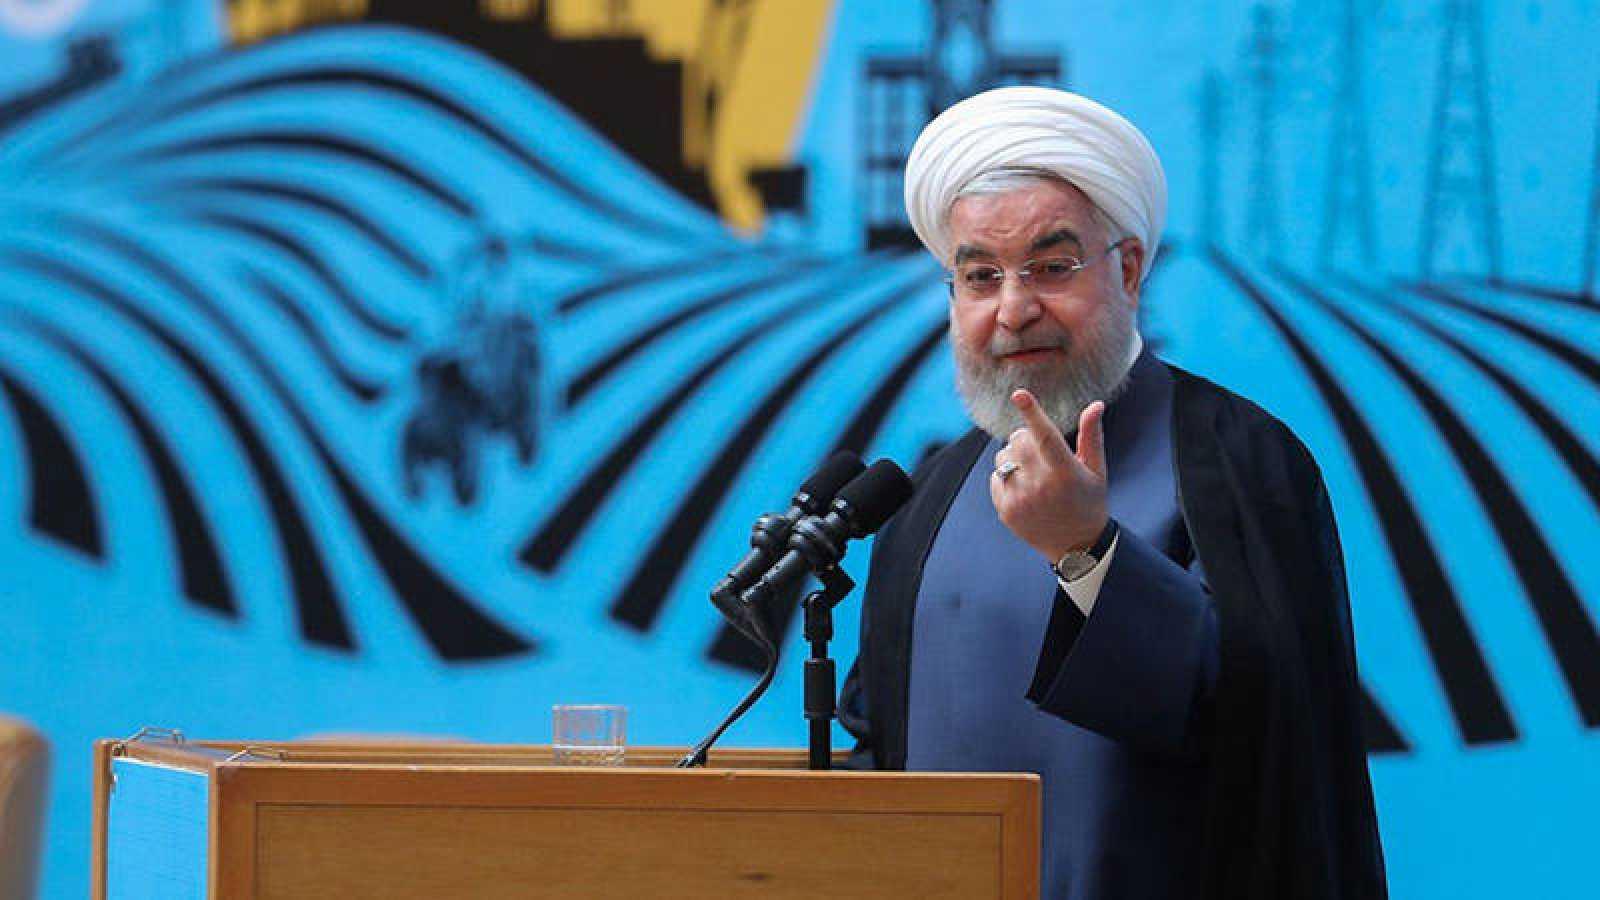 El presidente de Irán, Hasan Rohaní